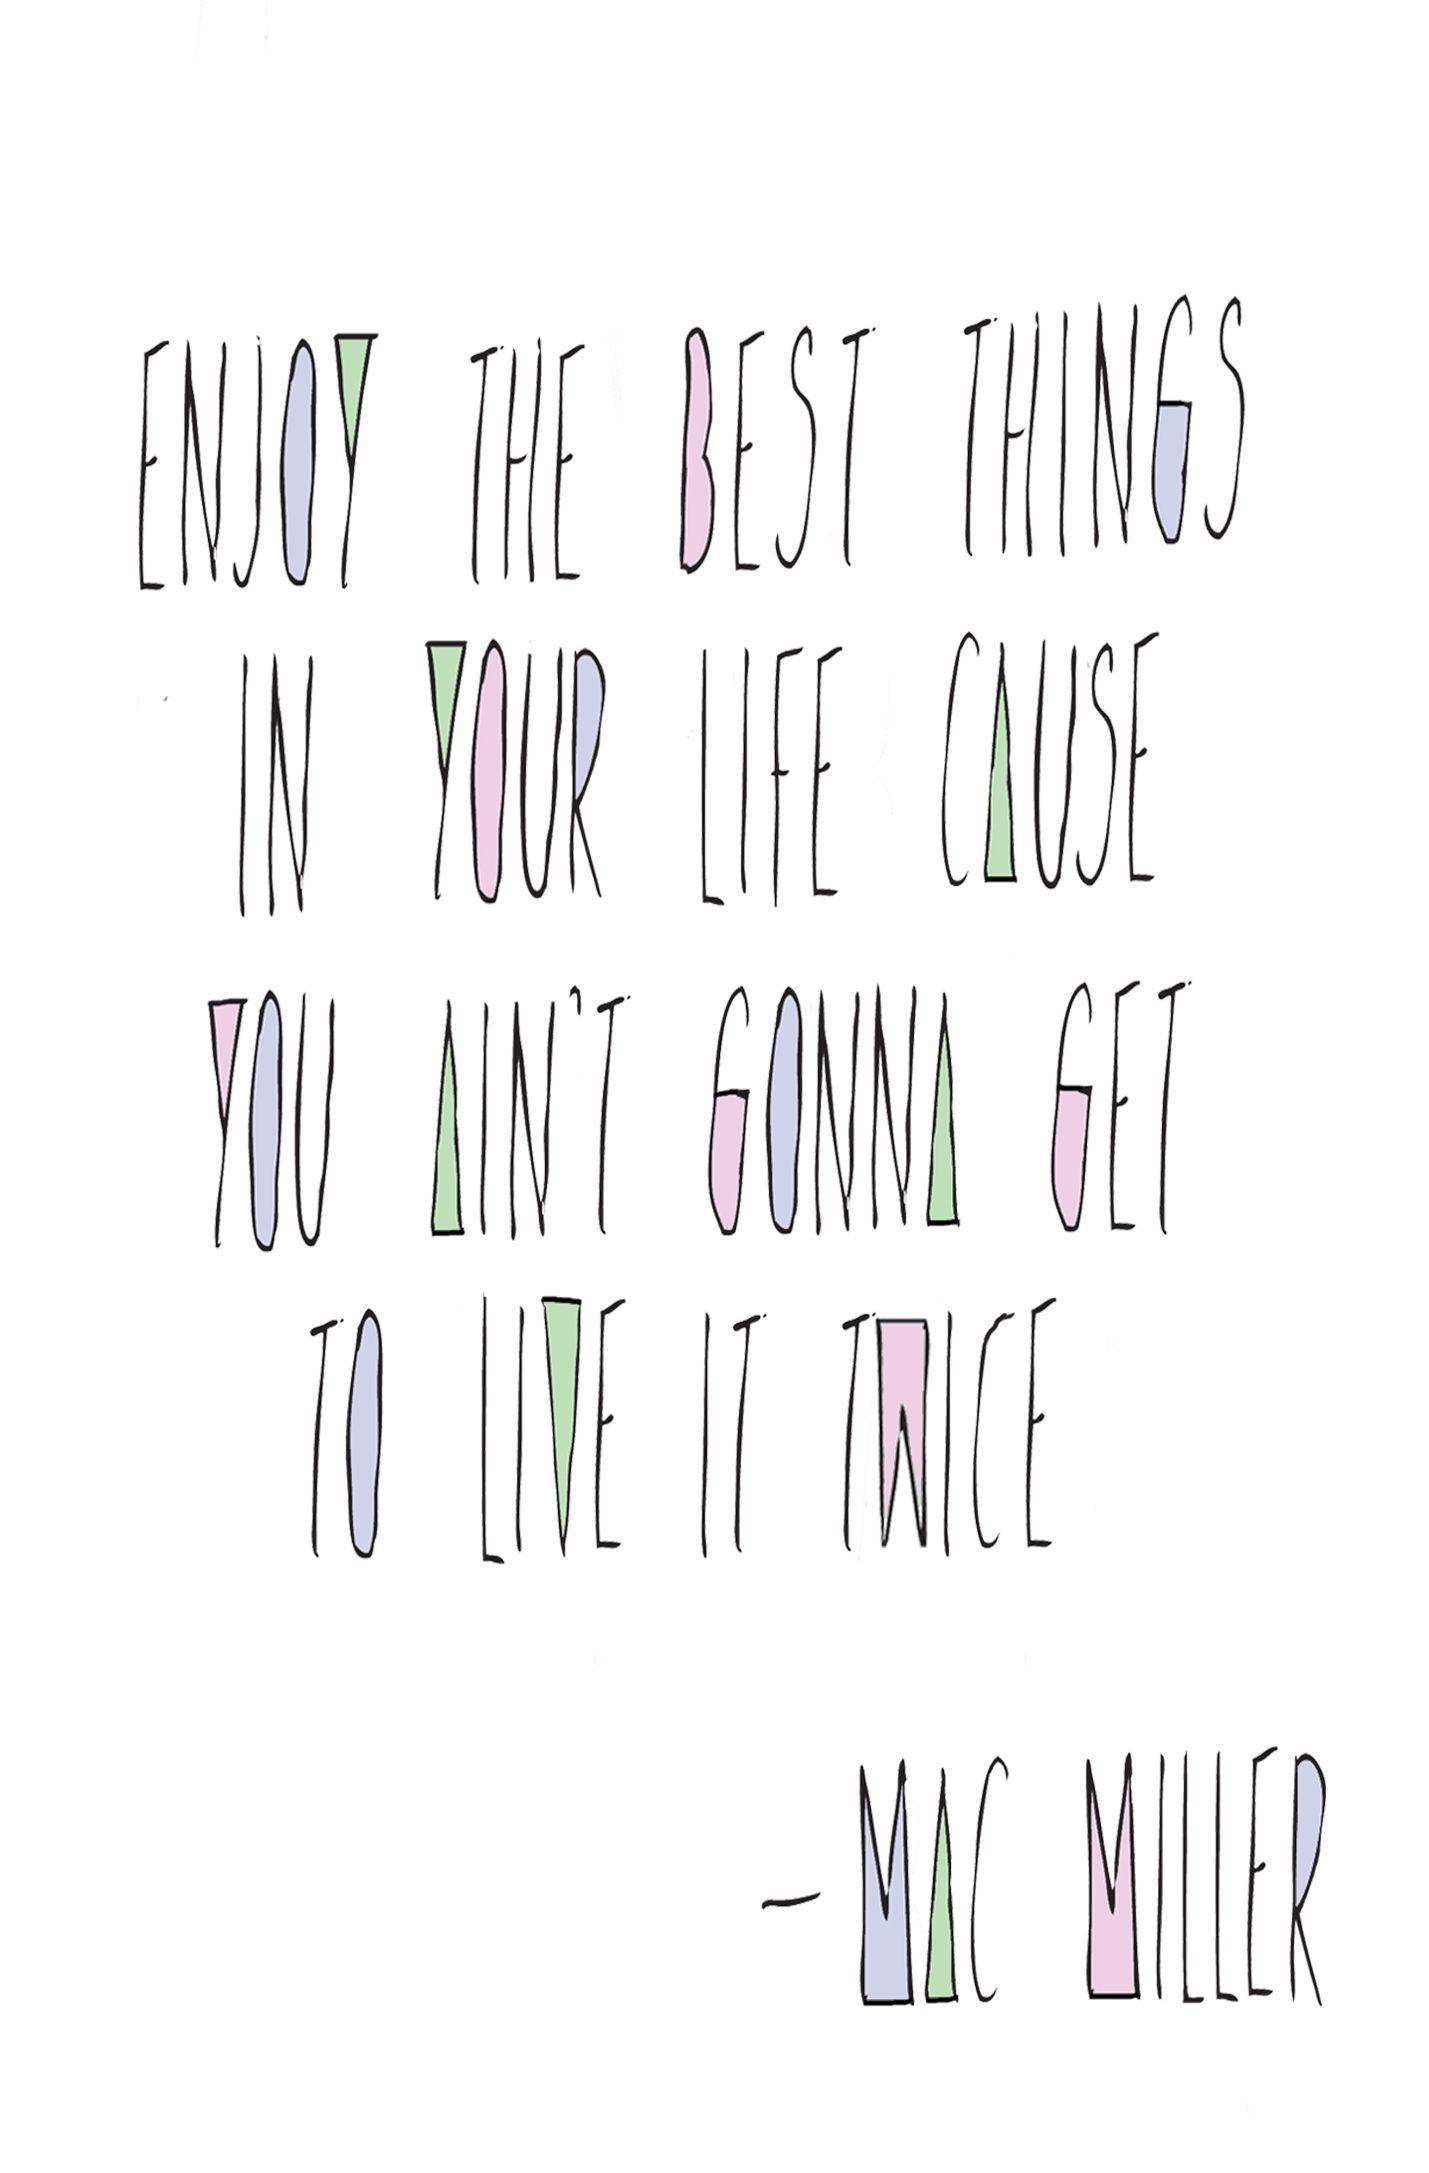 Mac Miller Quote #macmiller Mac Miller Quote #macmiller